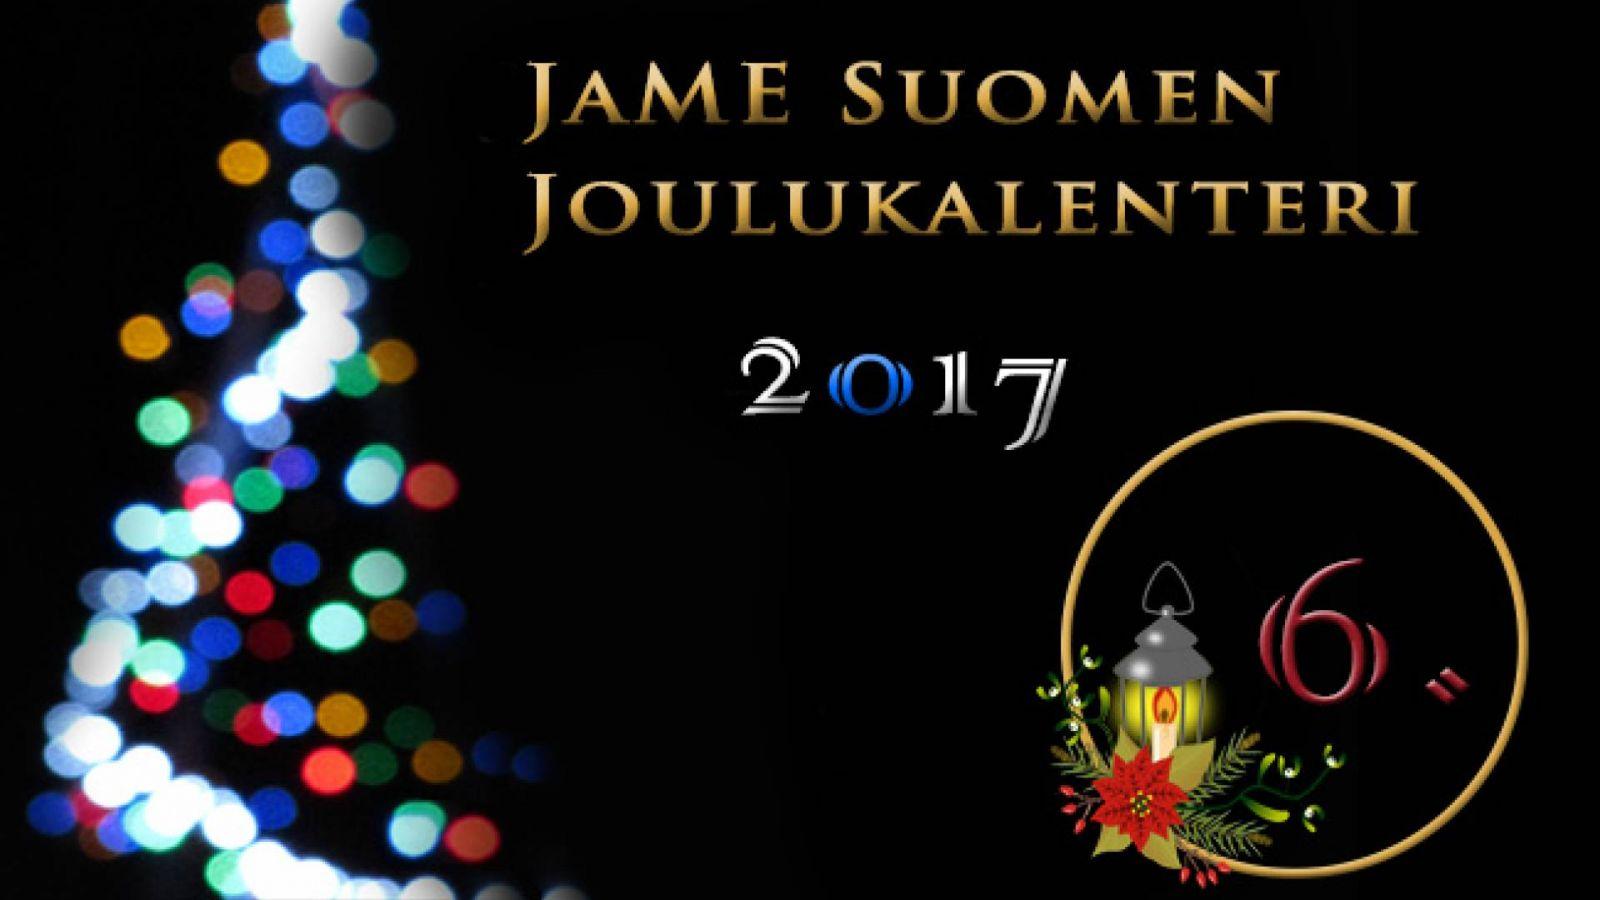 JaME Suomen joulukalenterin 6. luukku © Nipsu